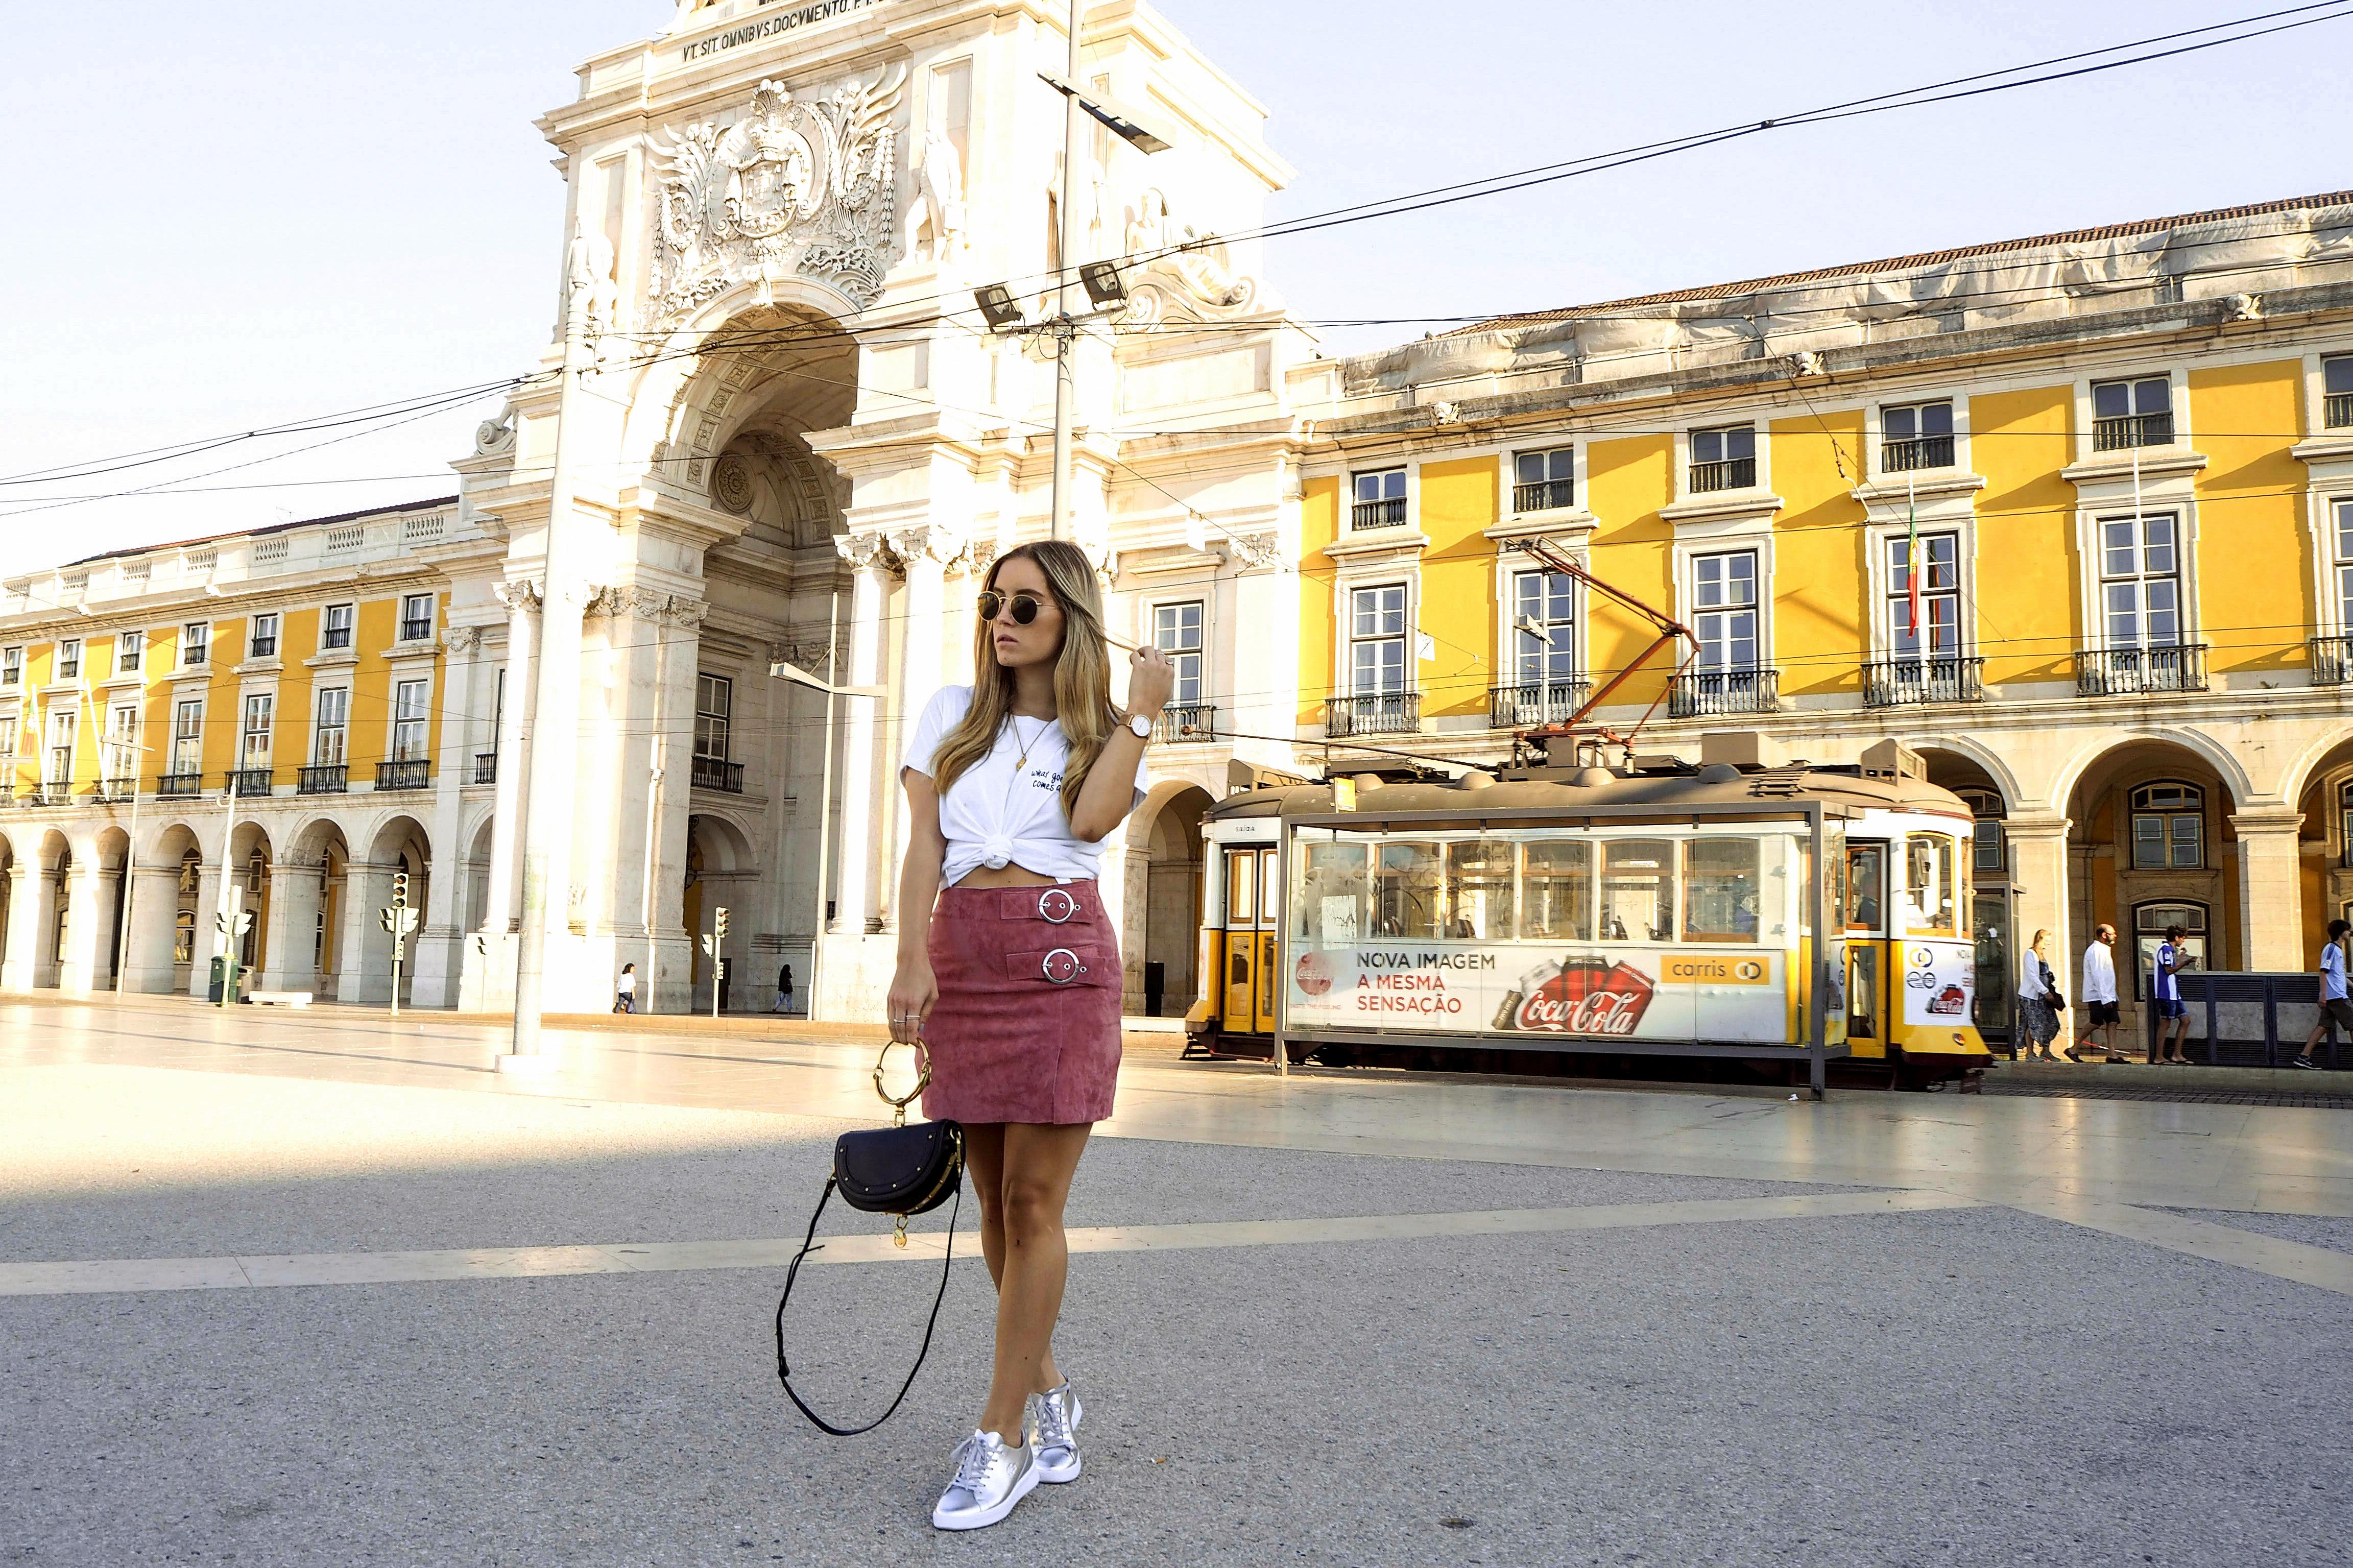 hot-spots-of-lisbon-travel-diary-lisboa-lissabon-reiseblog-travel-blog-2